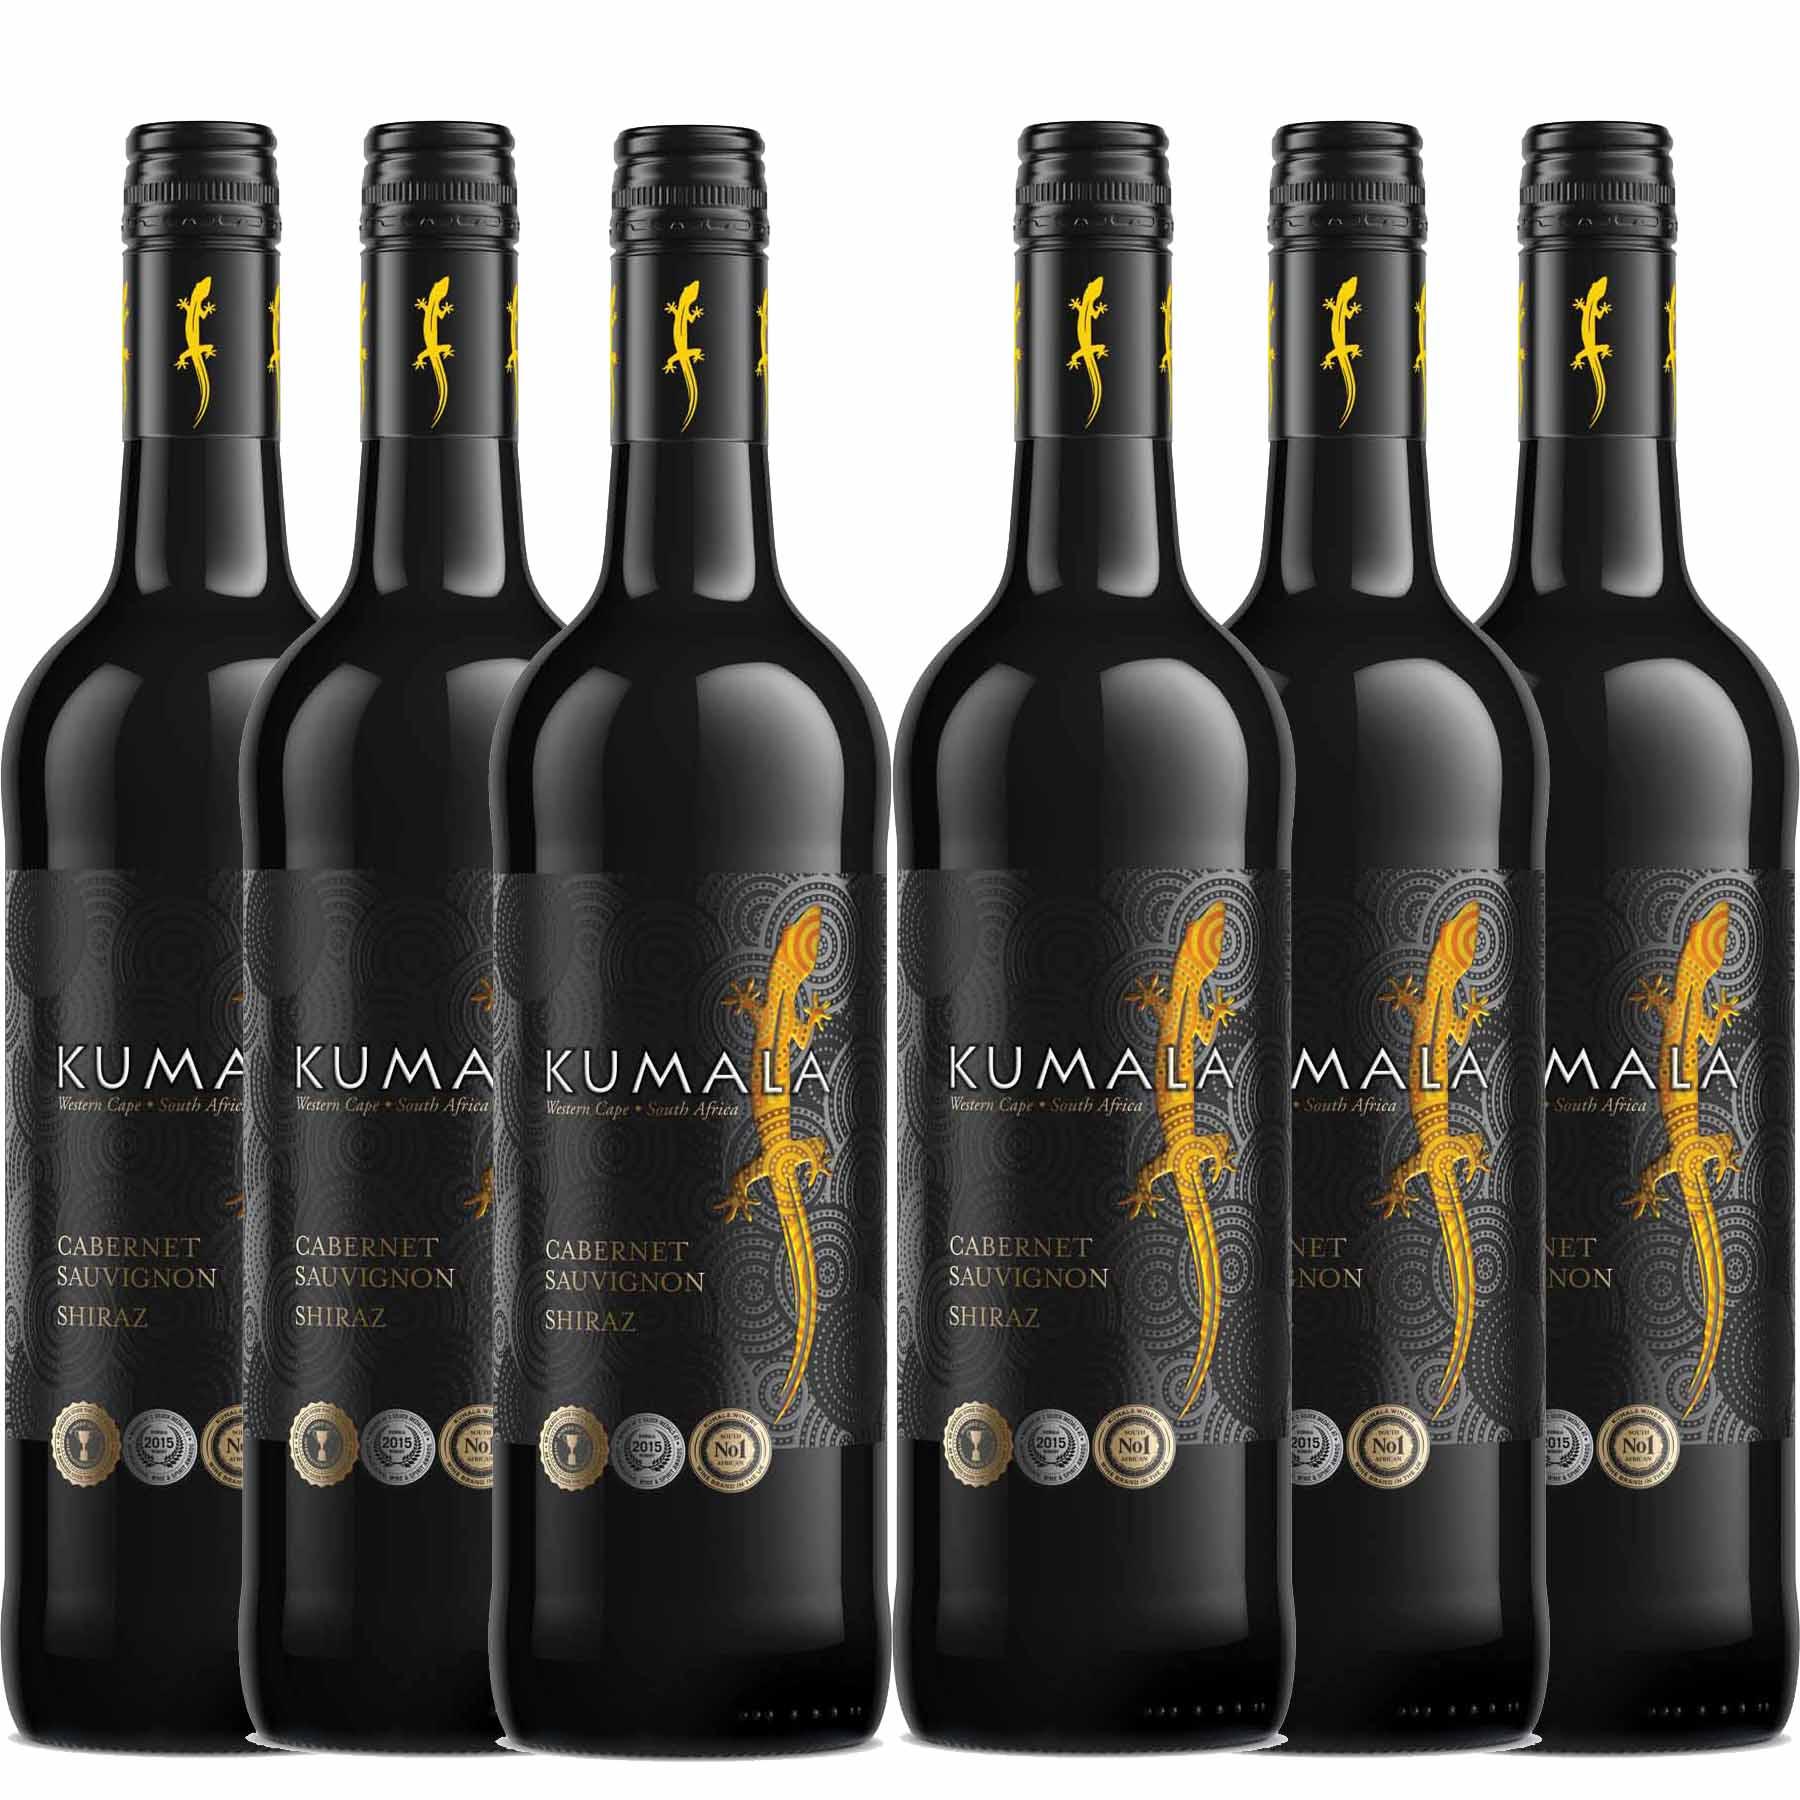 Kit 6x Vinho Tinto Sul Africano Kumala Cabernet/Shiraz 2019